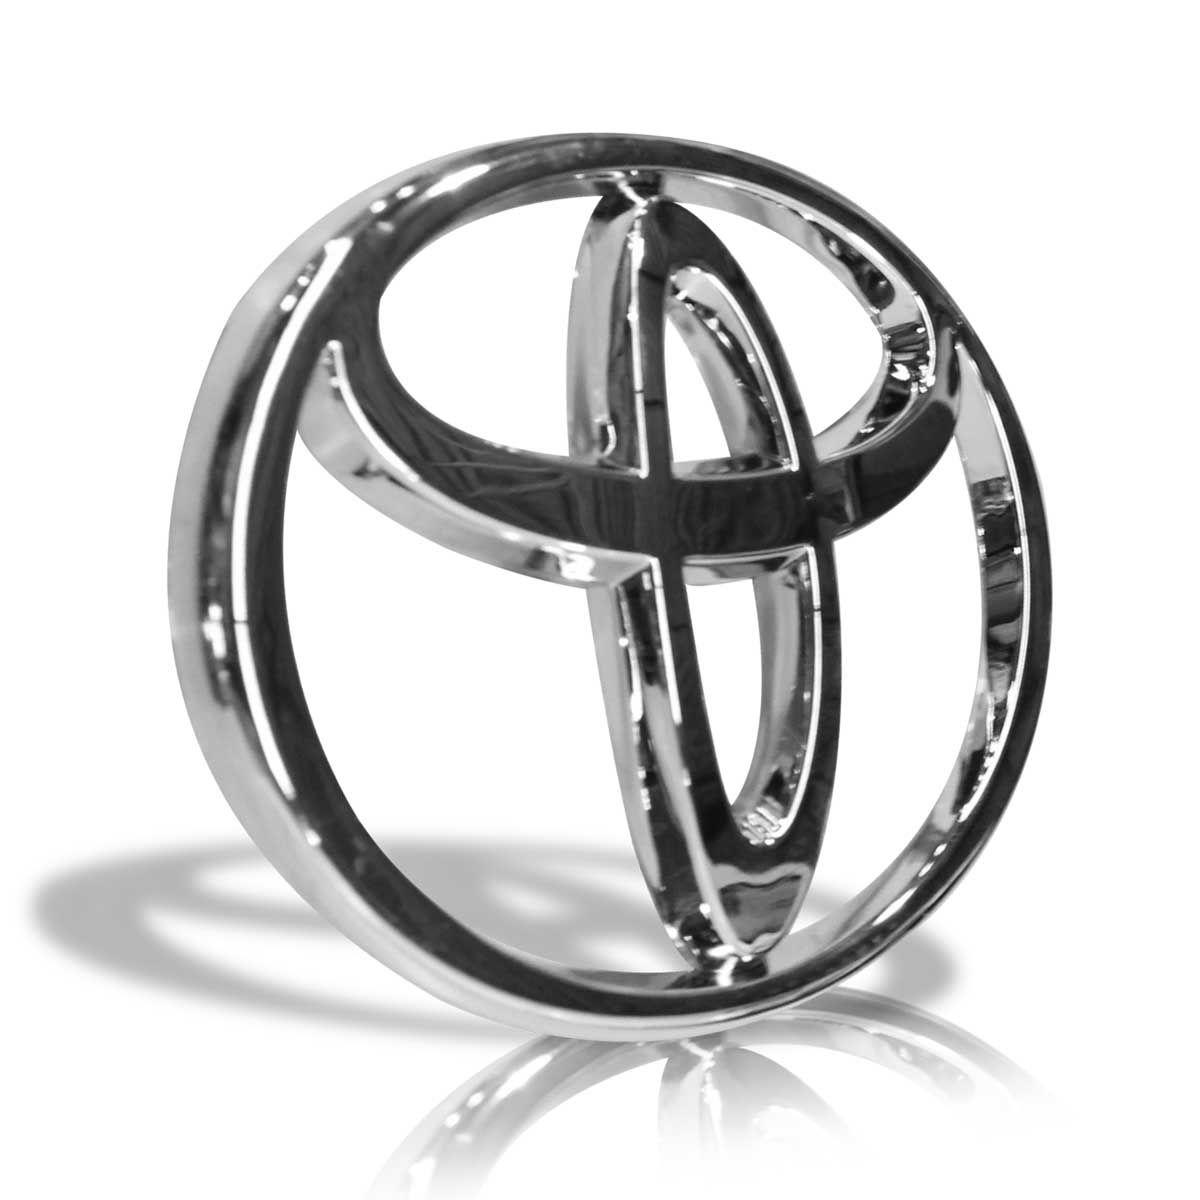 Emblema Logotipo Toyota Hilux 2005 a 2015